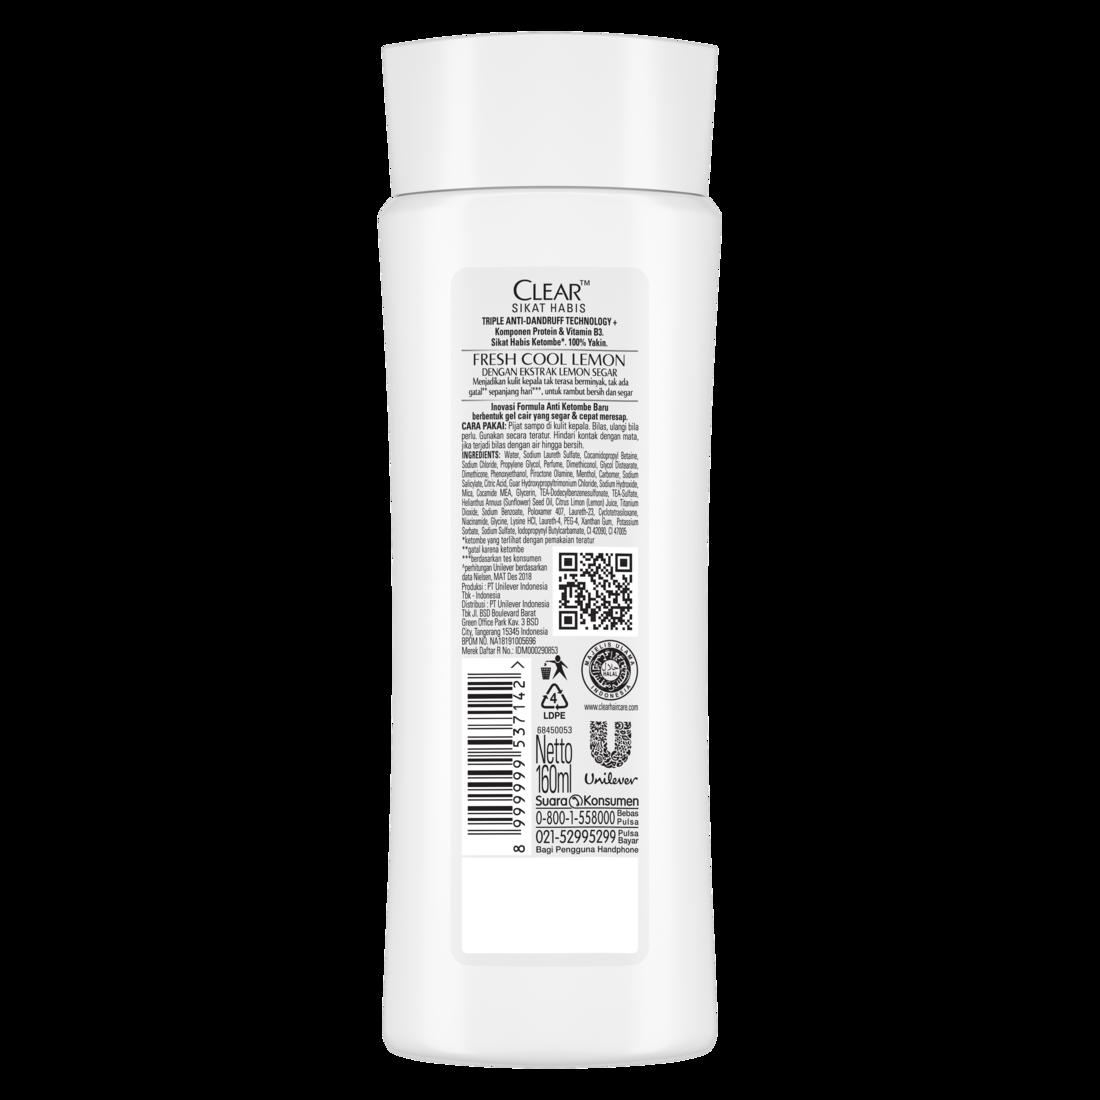 CLEAR Shampoo Anti Bacterial Fresh Cool Lemon 160 ml-1